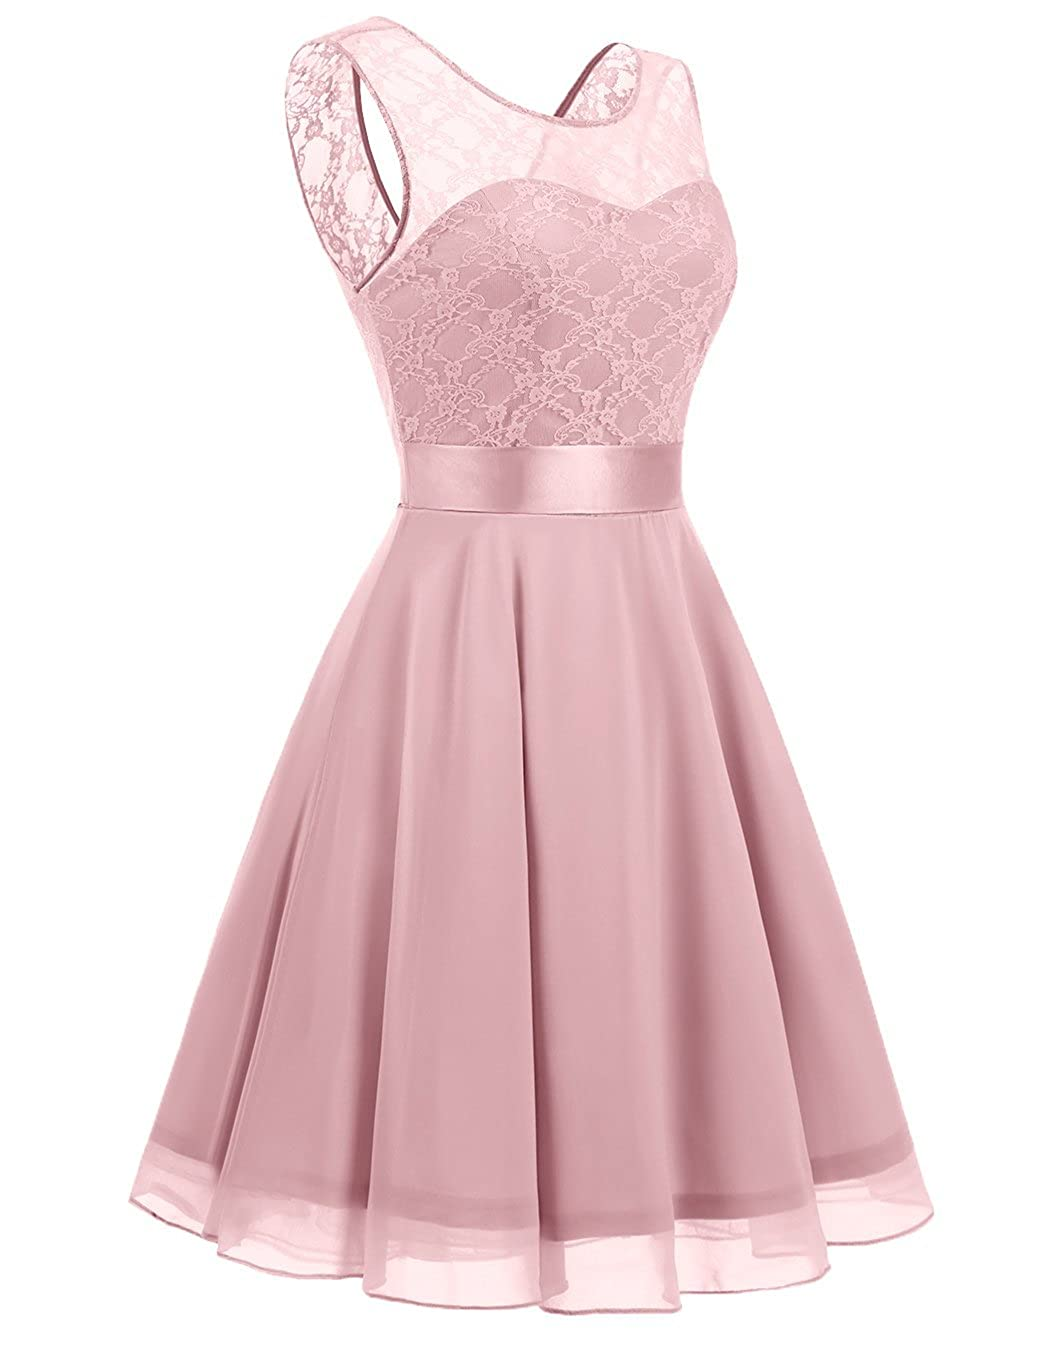 BeryLove Women\'s Short Floral Lace Bridesmaid Dress A-line Swing ...